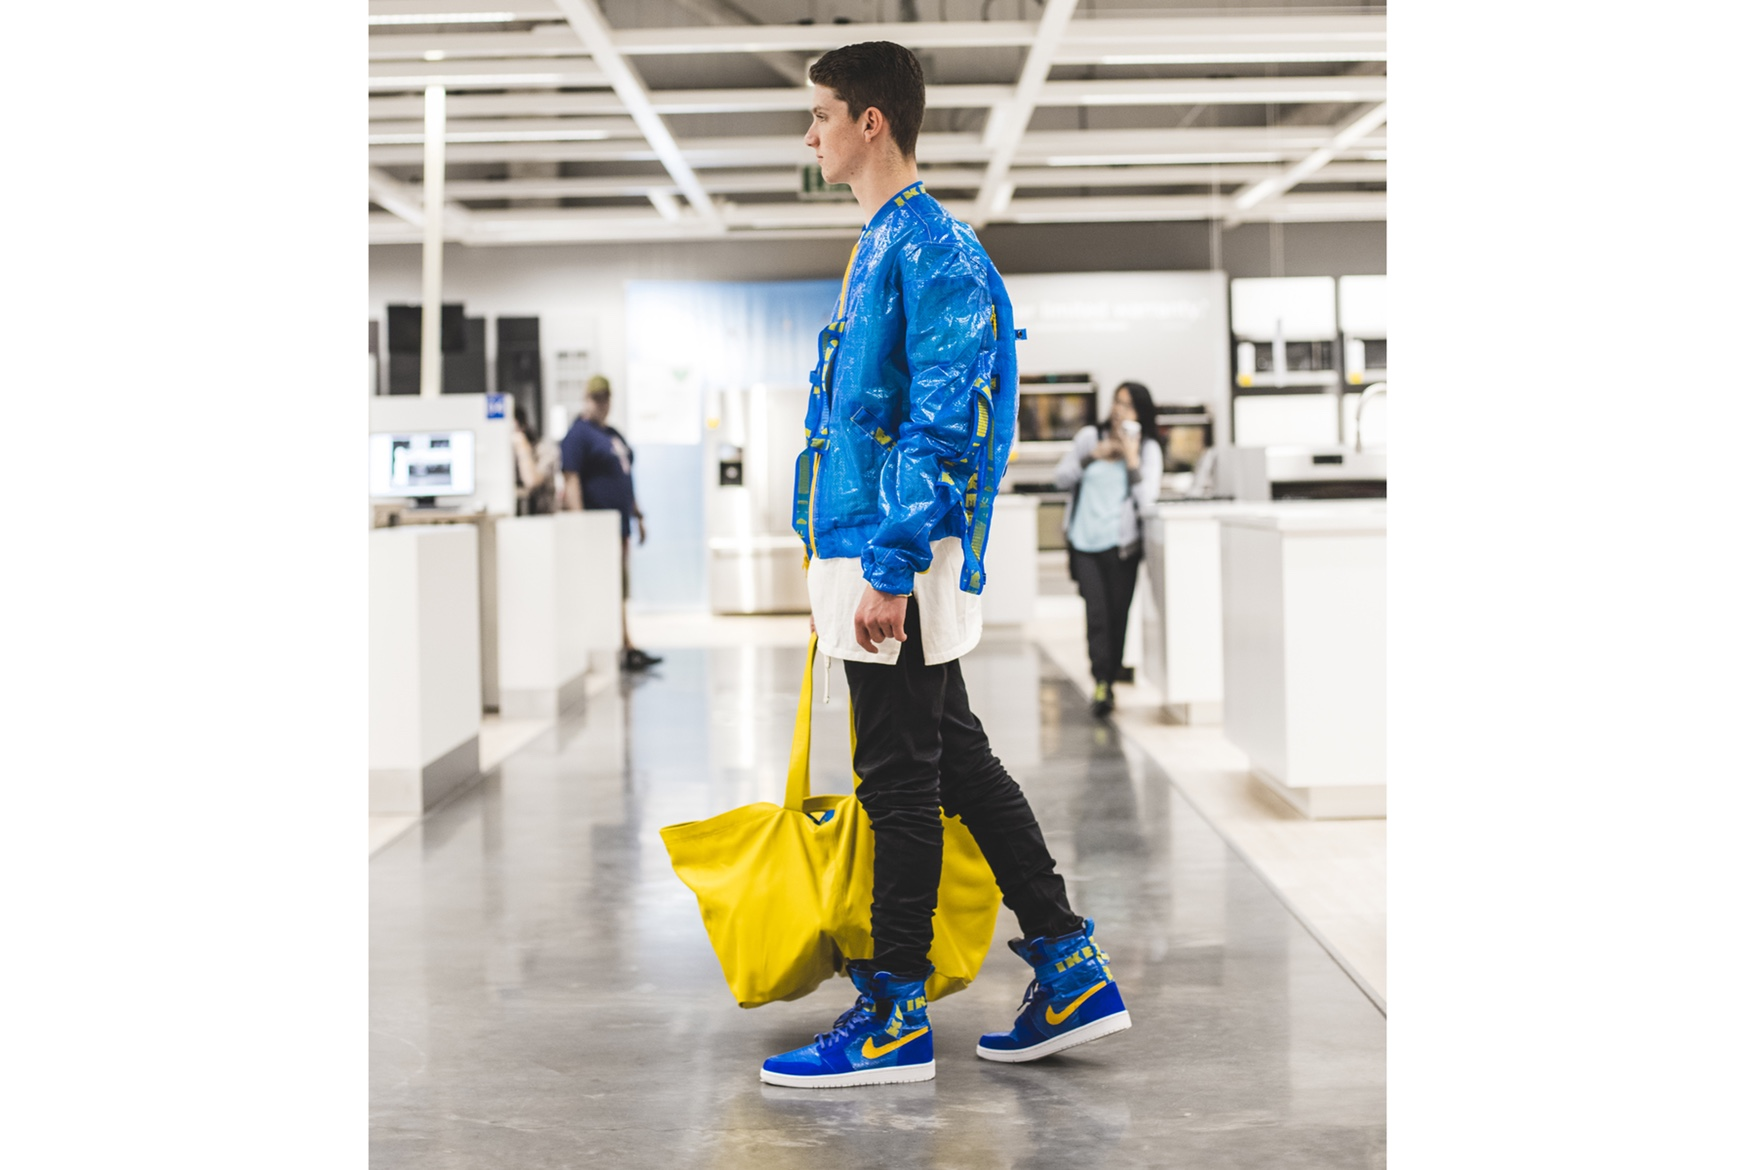 http-hypebeast.comimage201705the-shoe-surgeon-air-jordan-1-ikea-custom-pack-03